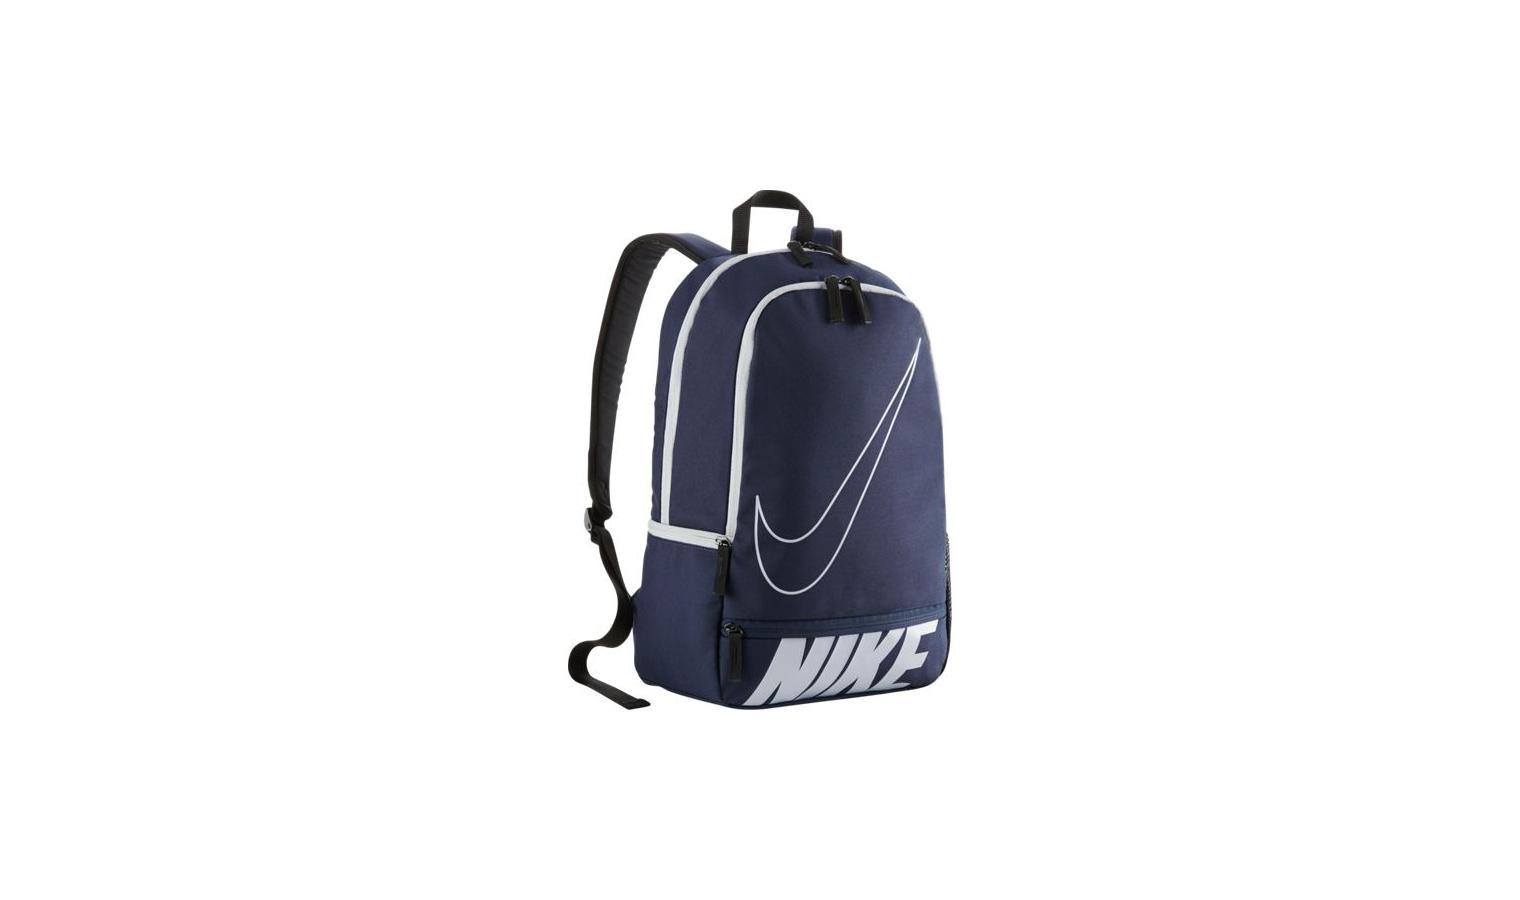 Batoh Nike CLASSIC NORTH modrý  a47e12bc6d